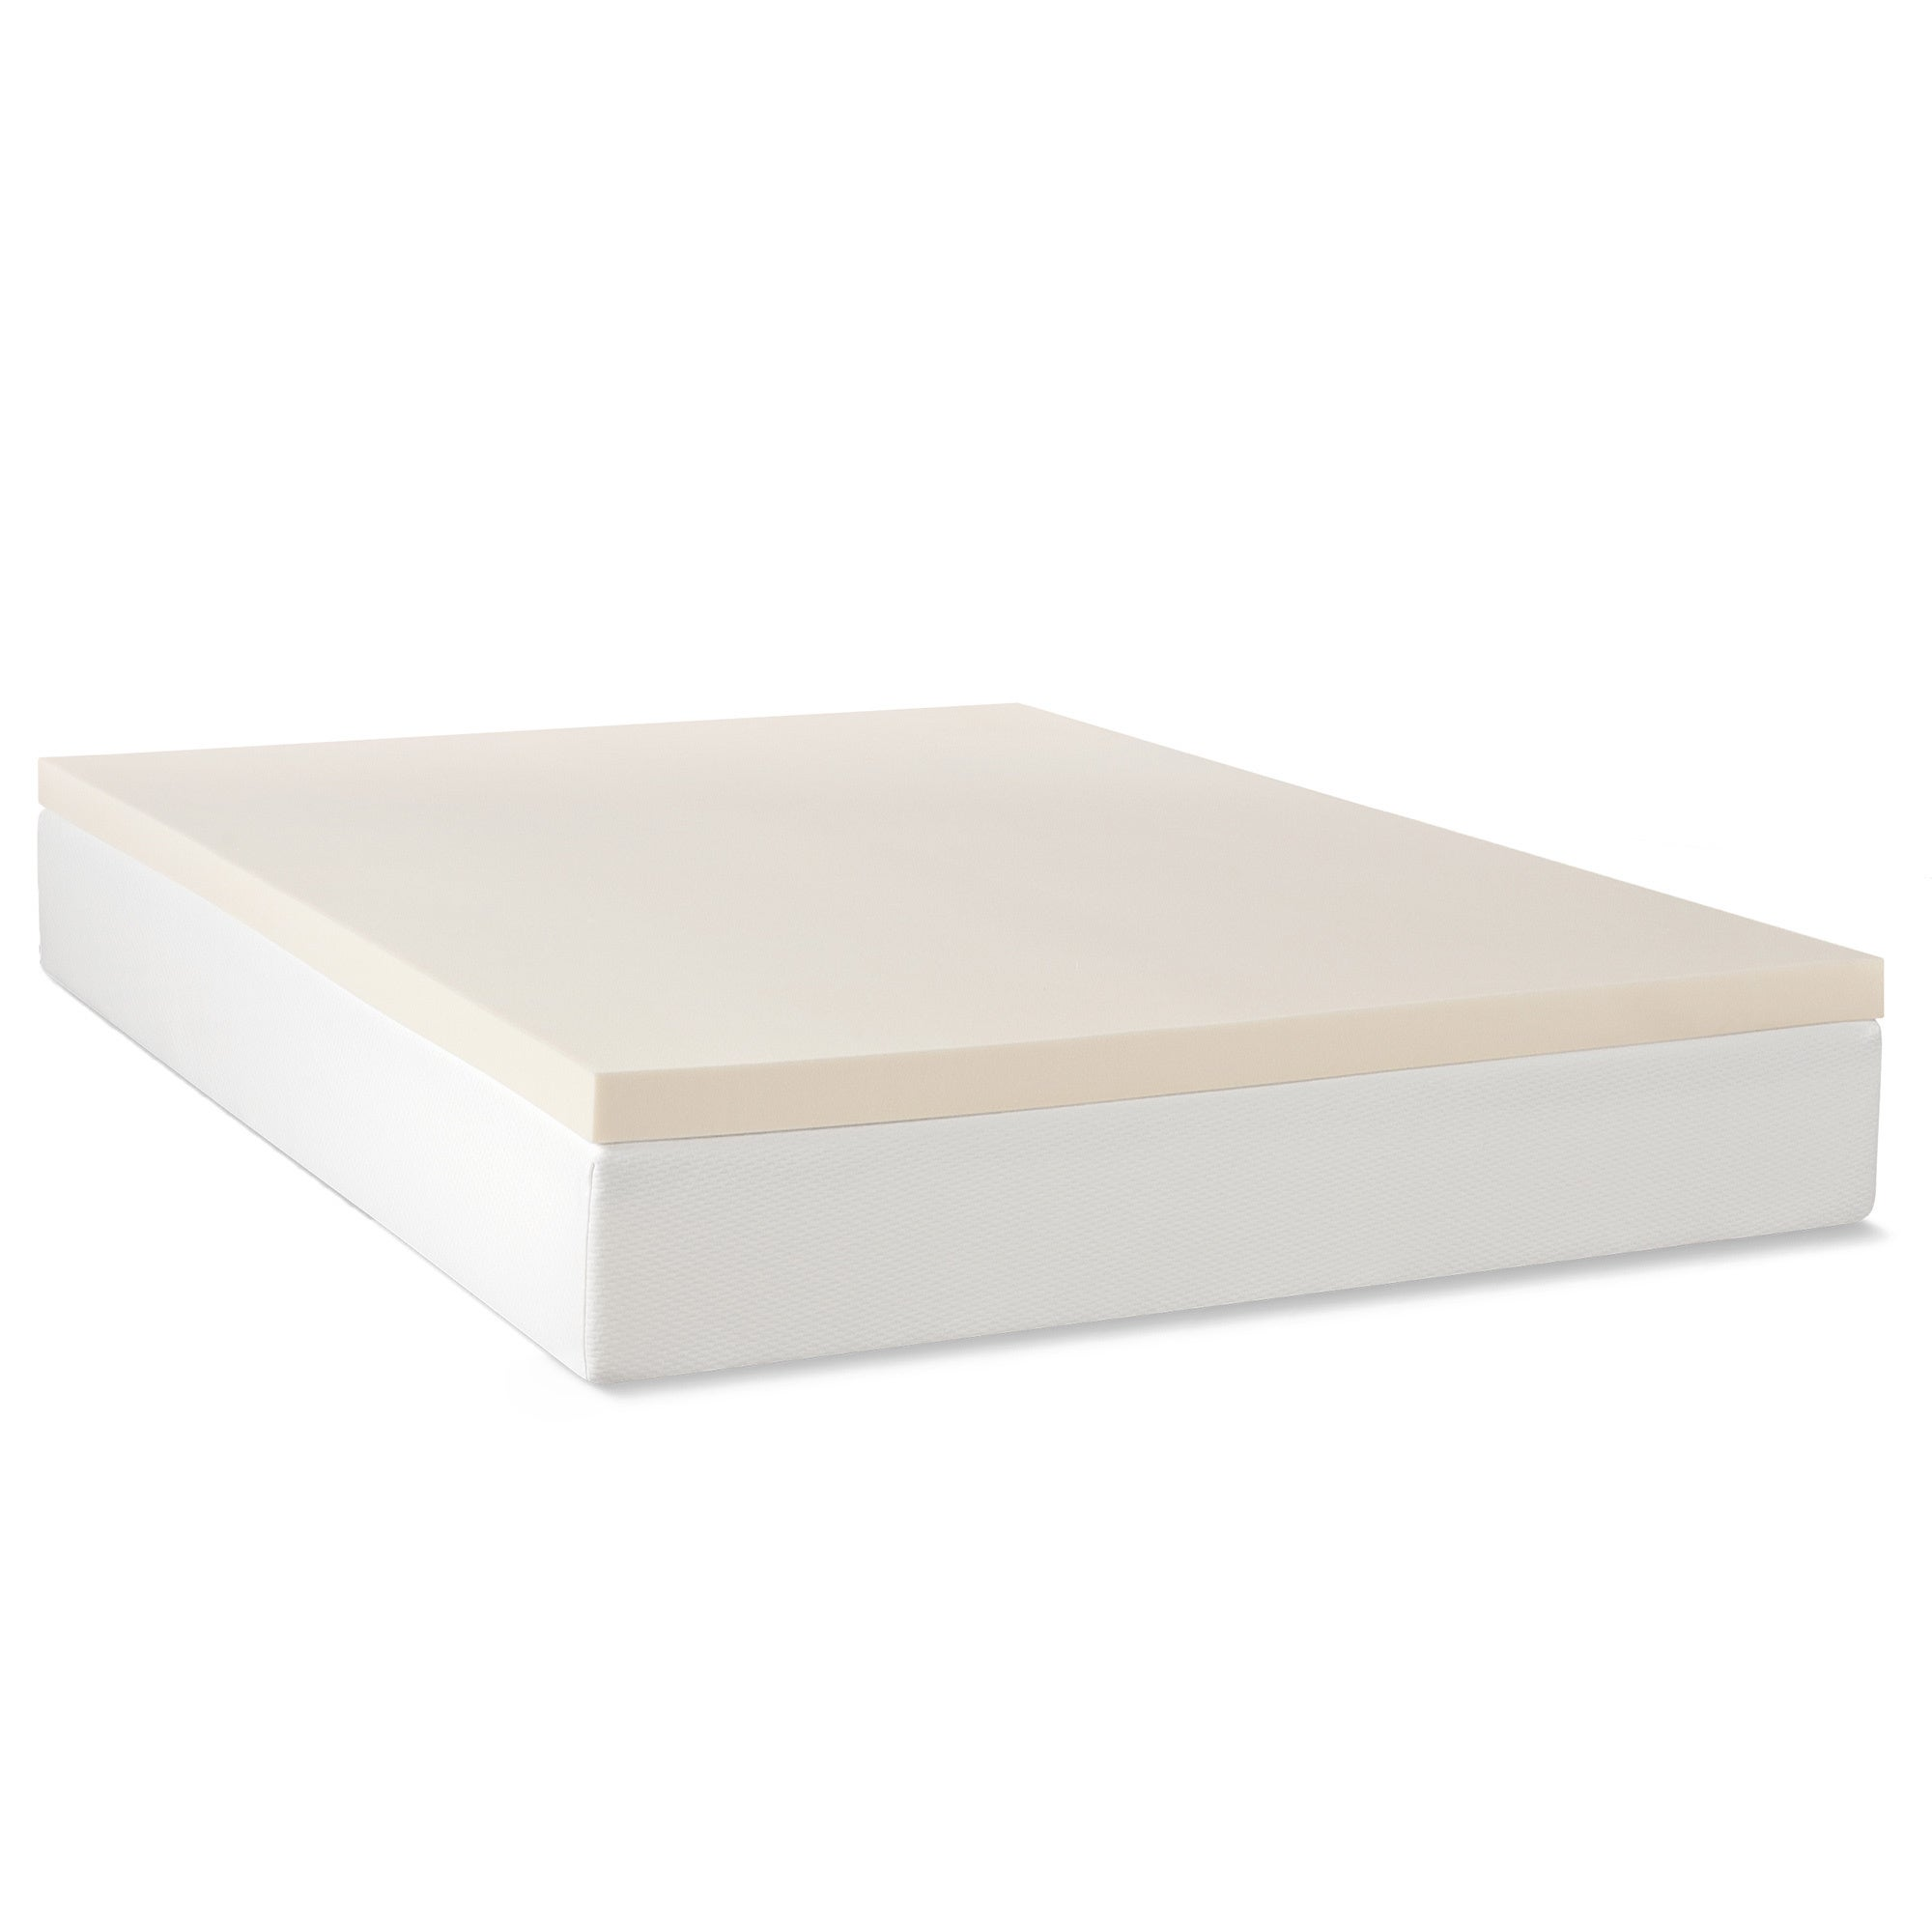 Shop Select Luxury Rv 2 Inch Memory Foam Mattress Topper Free